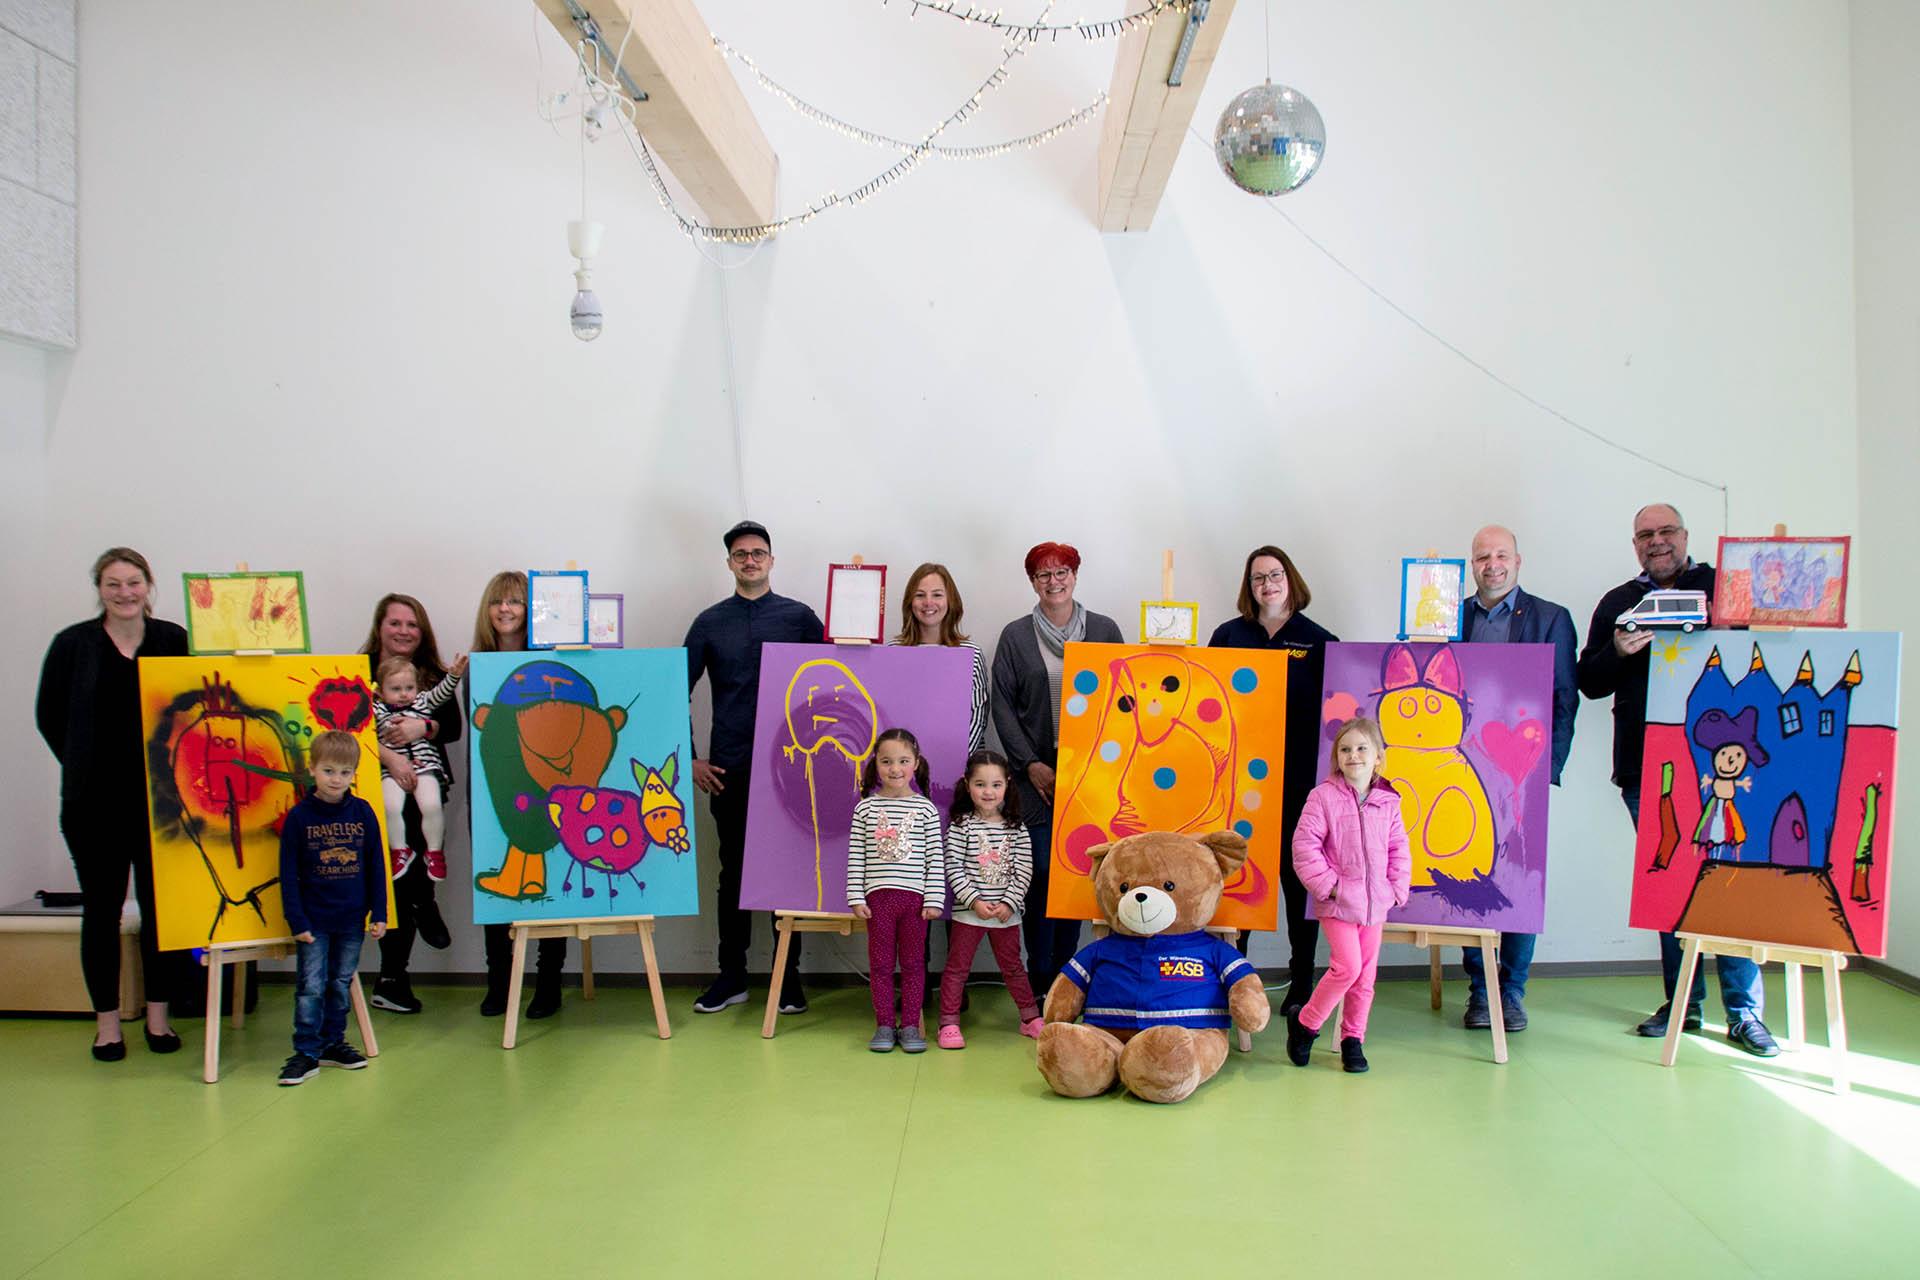 Spendenaktion mit dem Asb Münster –Graffiti, Kita, Workshop, Münster